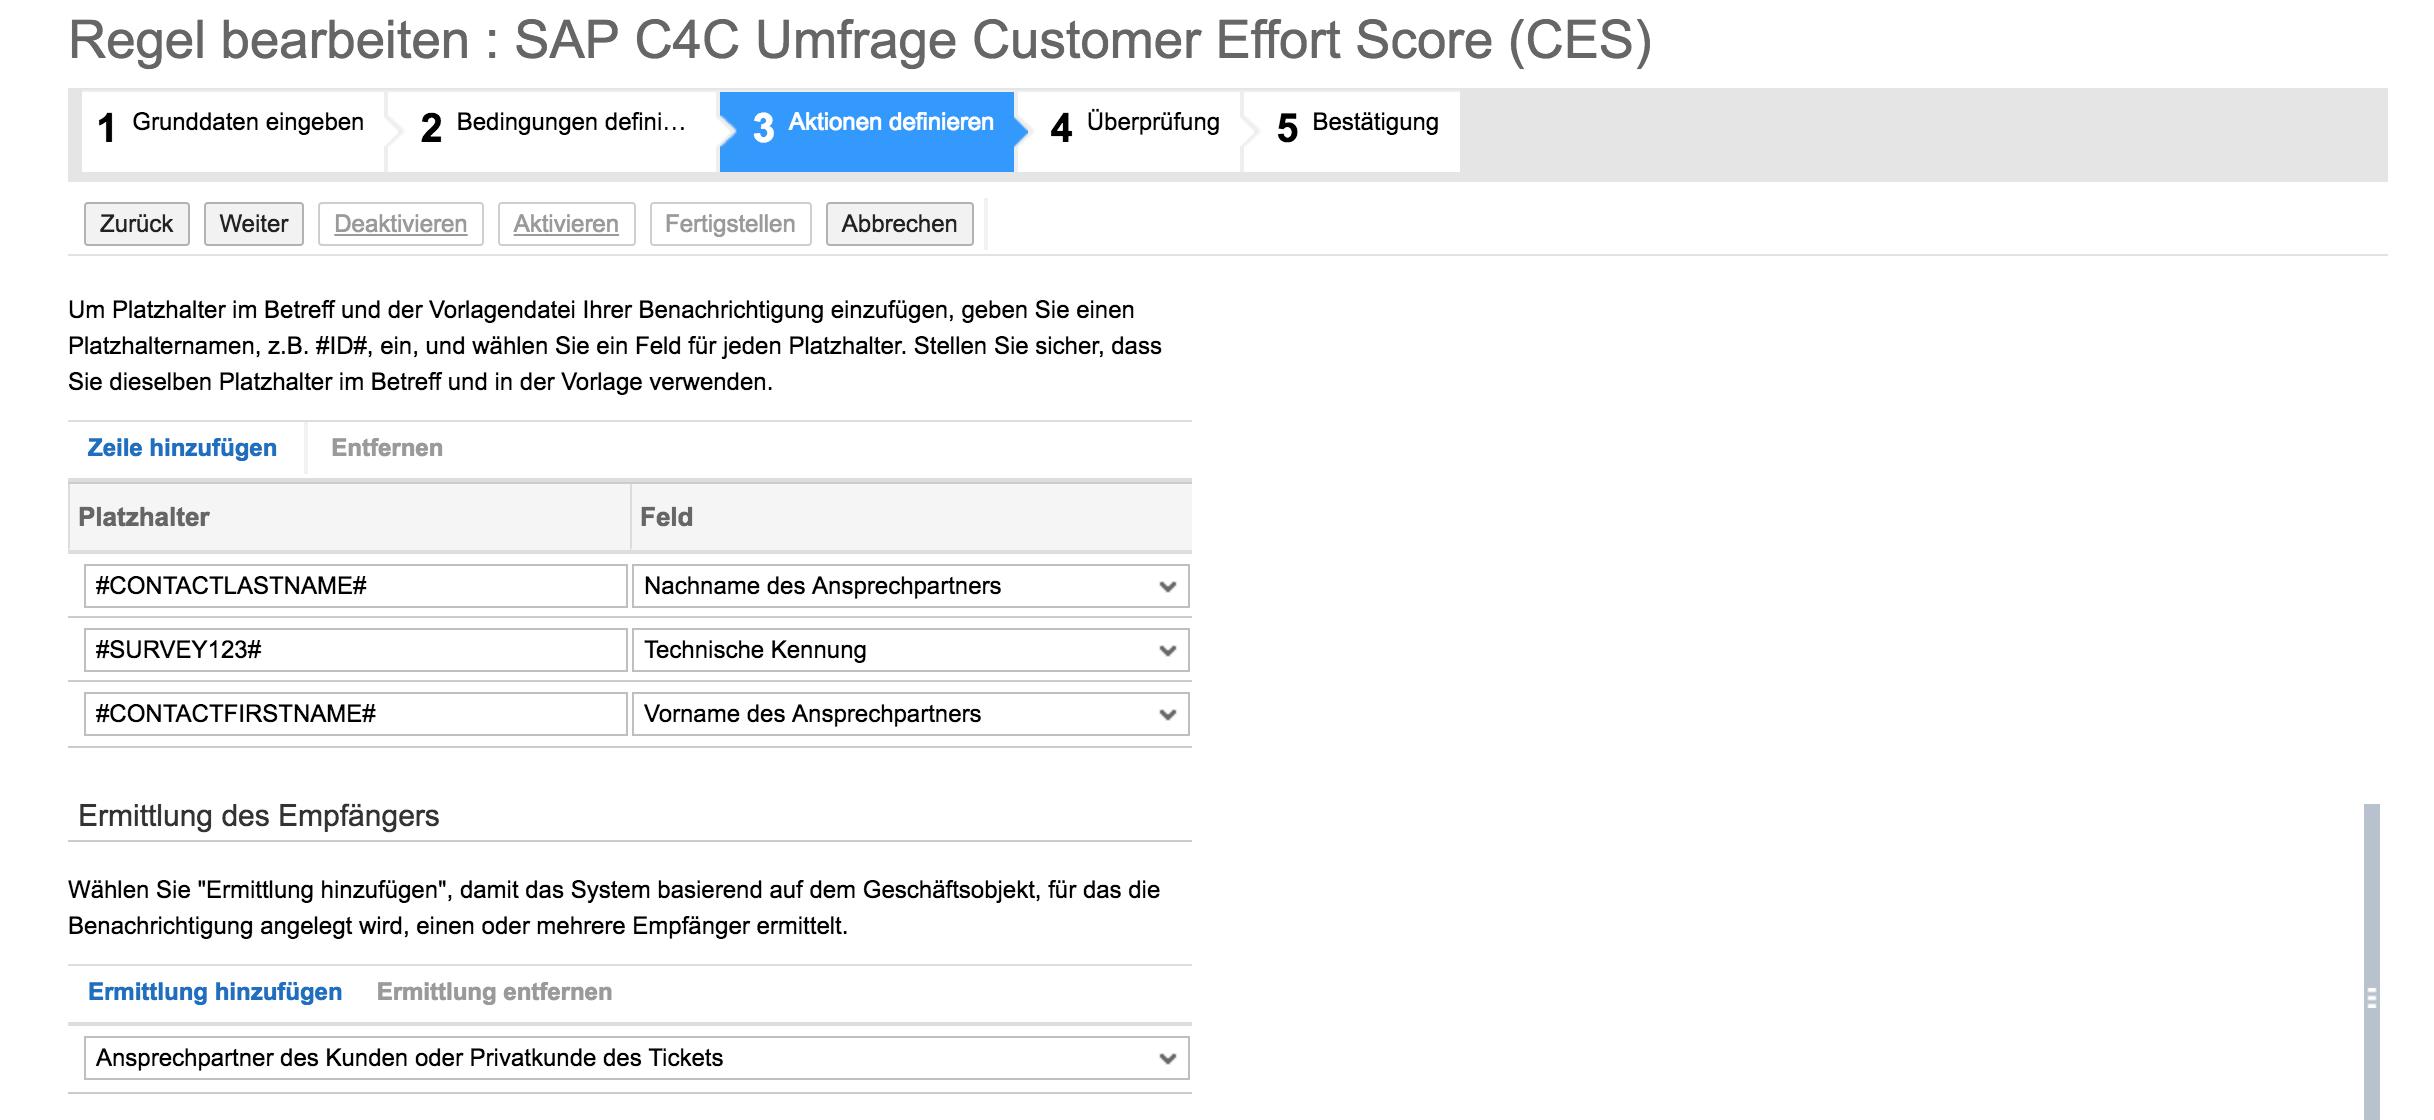 Dritter Schritt: Erstellen CES in SAP Hybris C4C